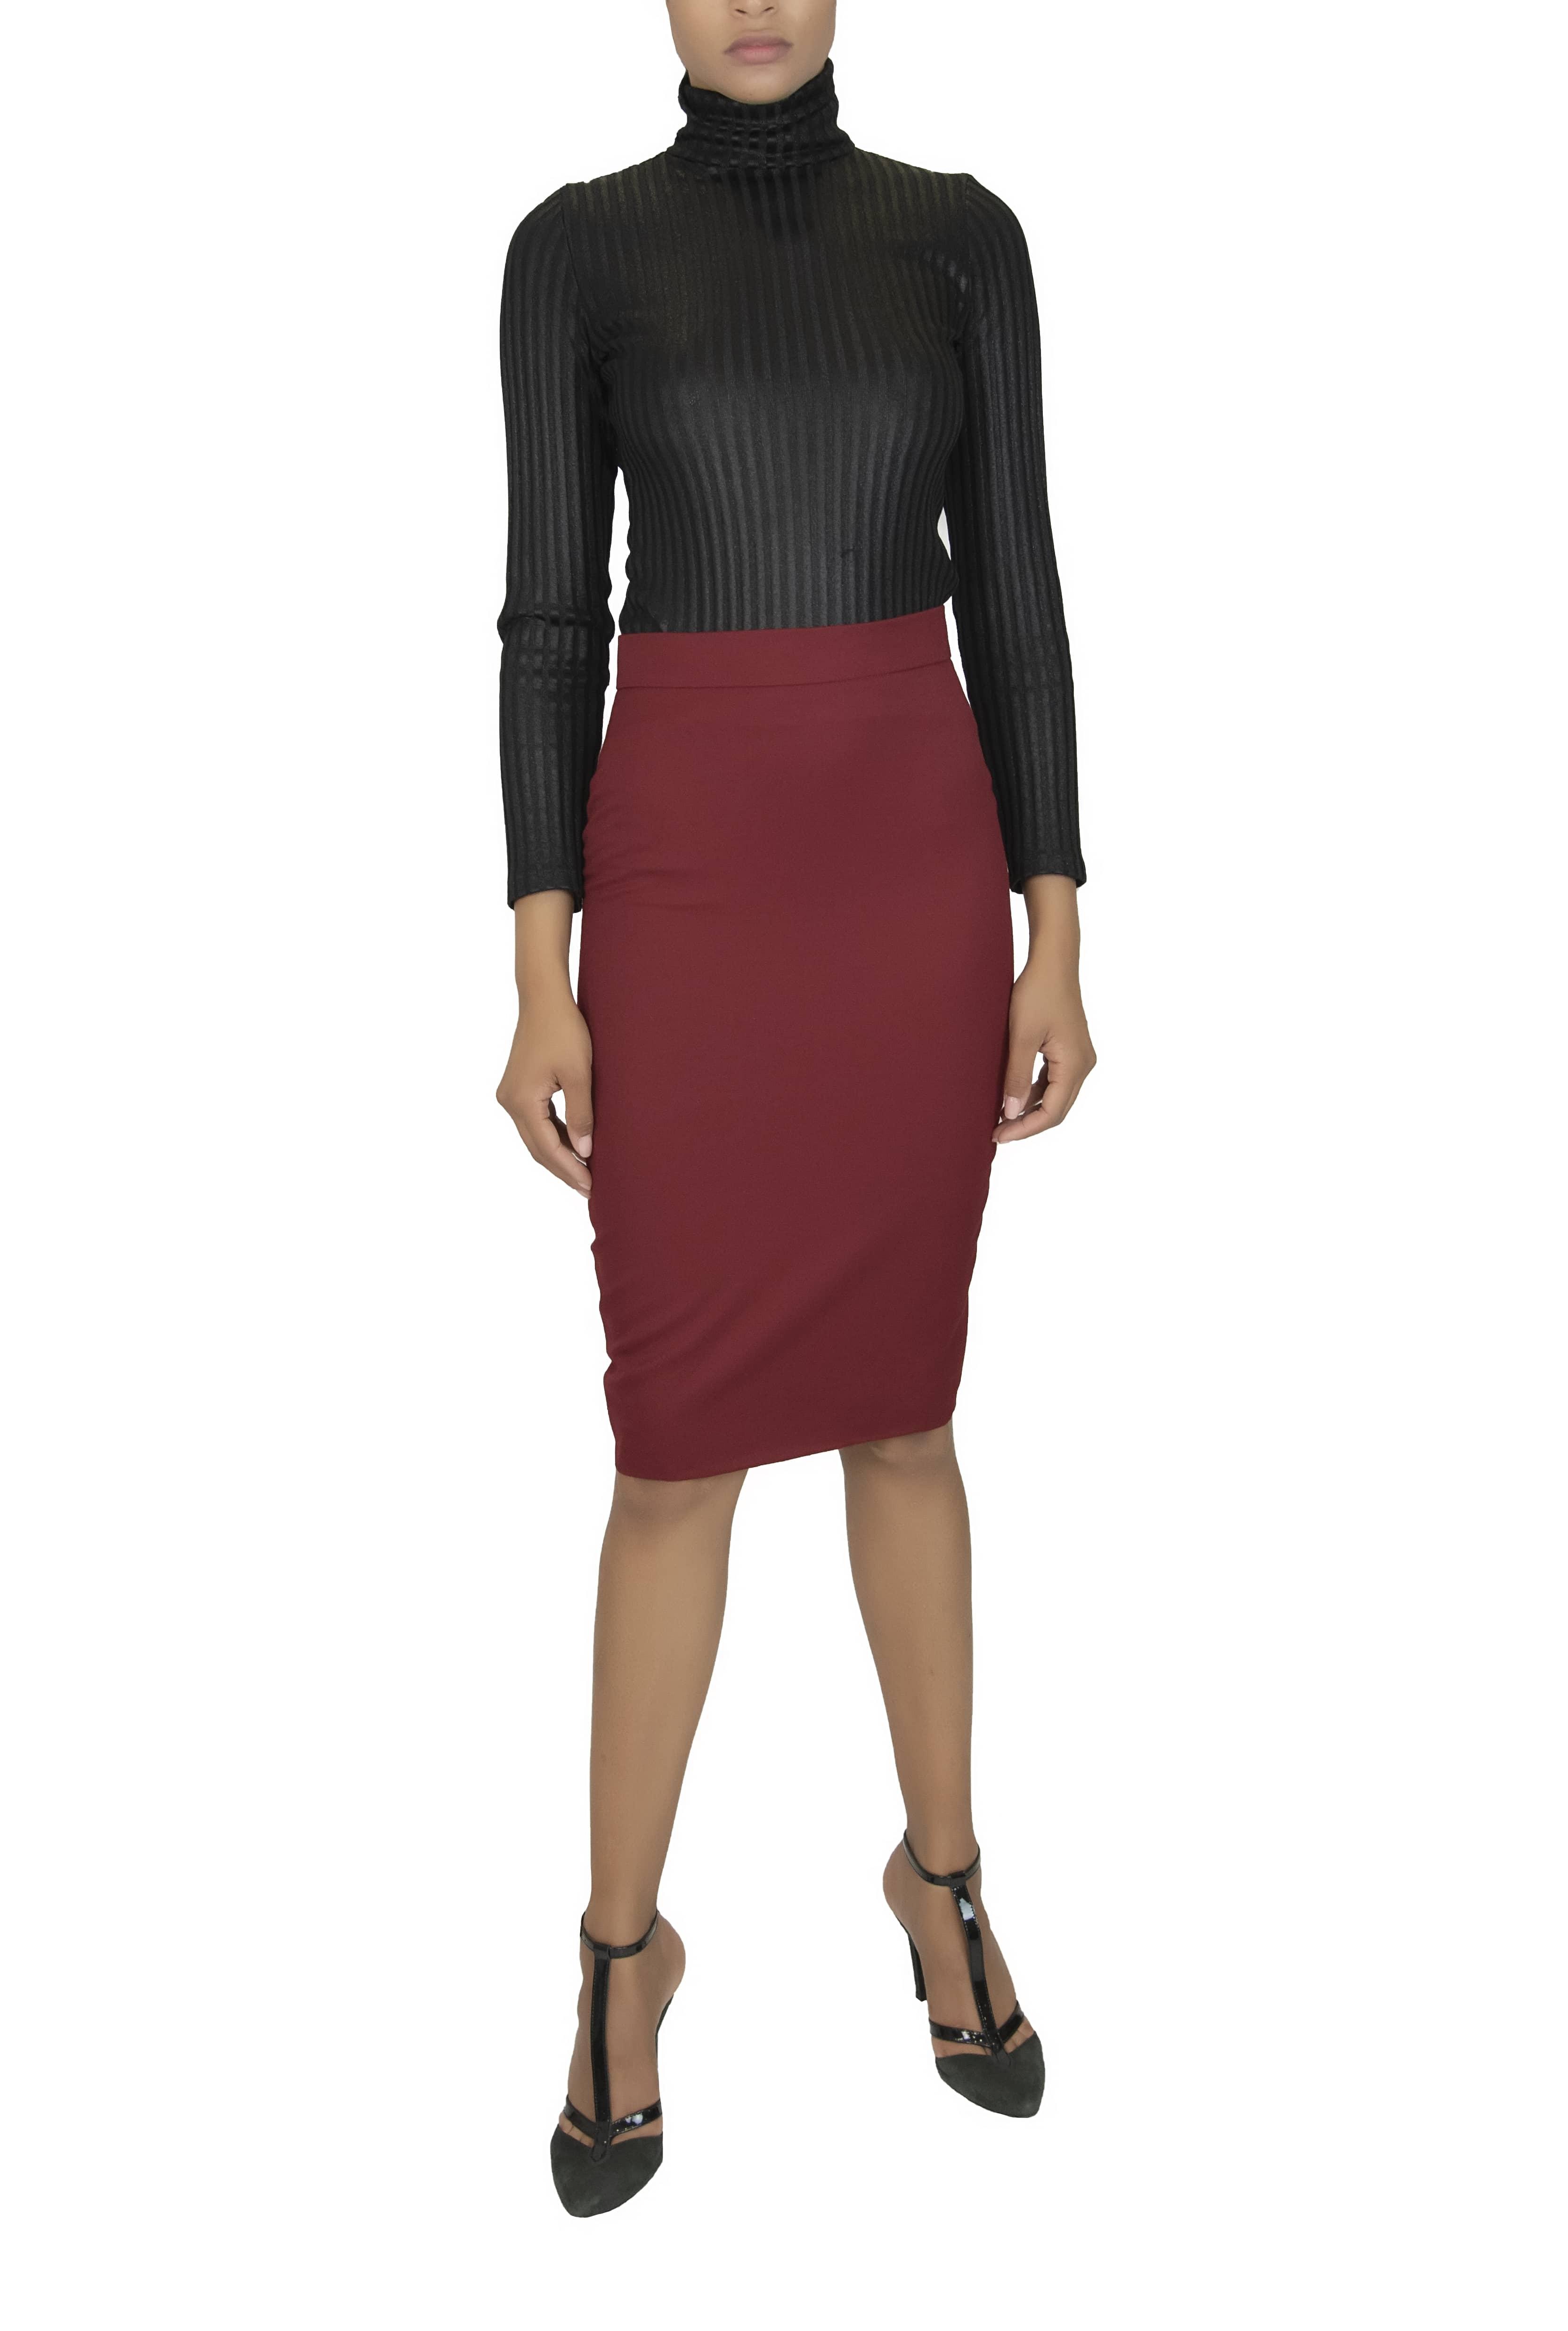 Skirt IKLIL 2